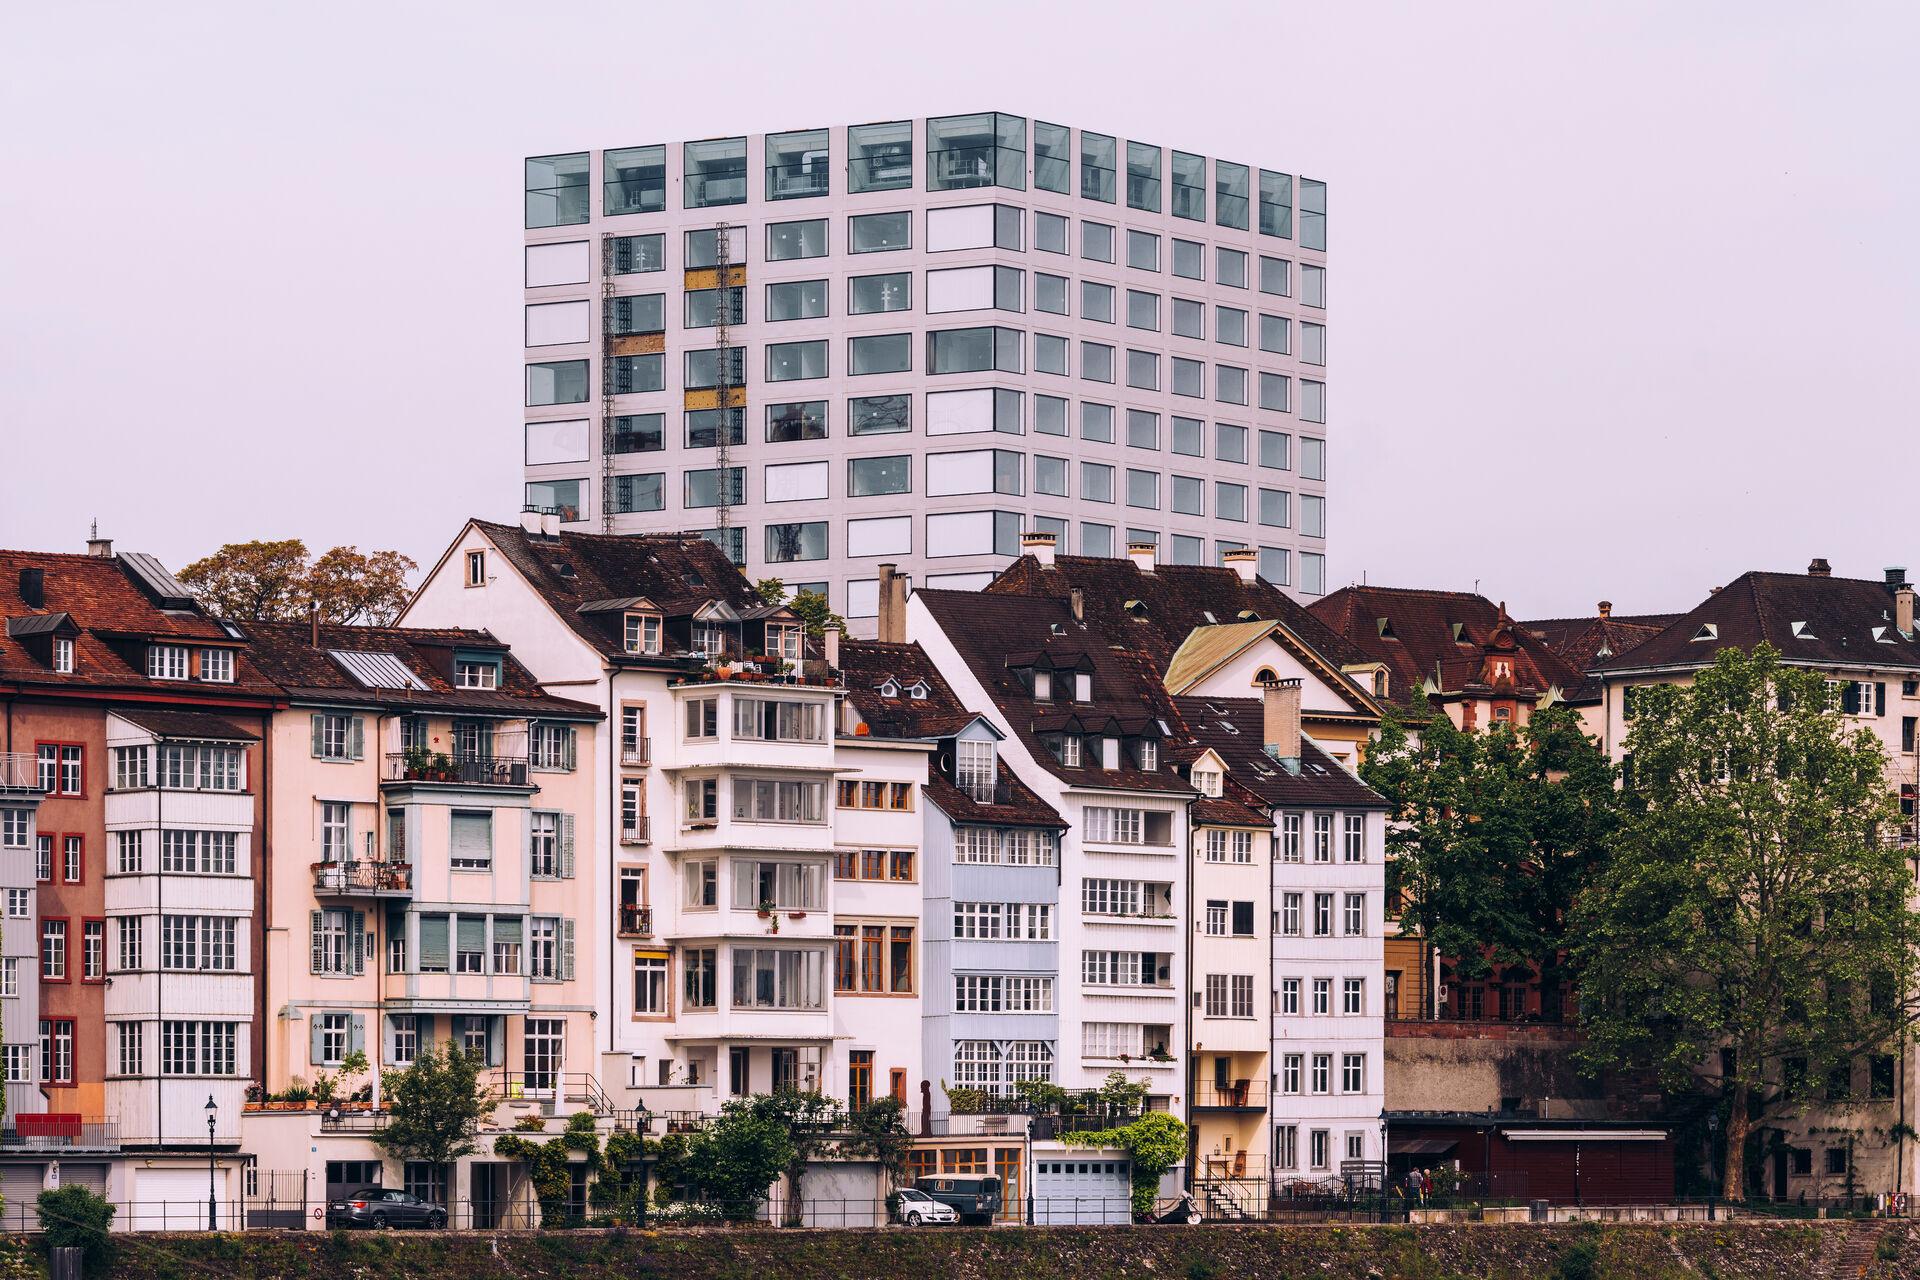 Neubau Biozentrum Basel / New building Biocenter Basel